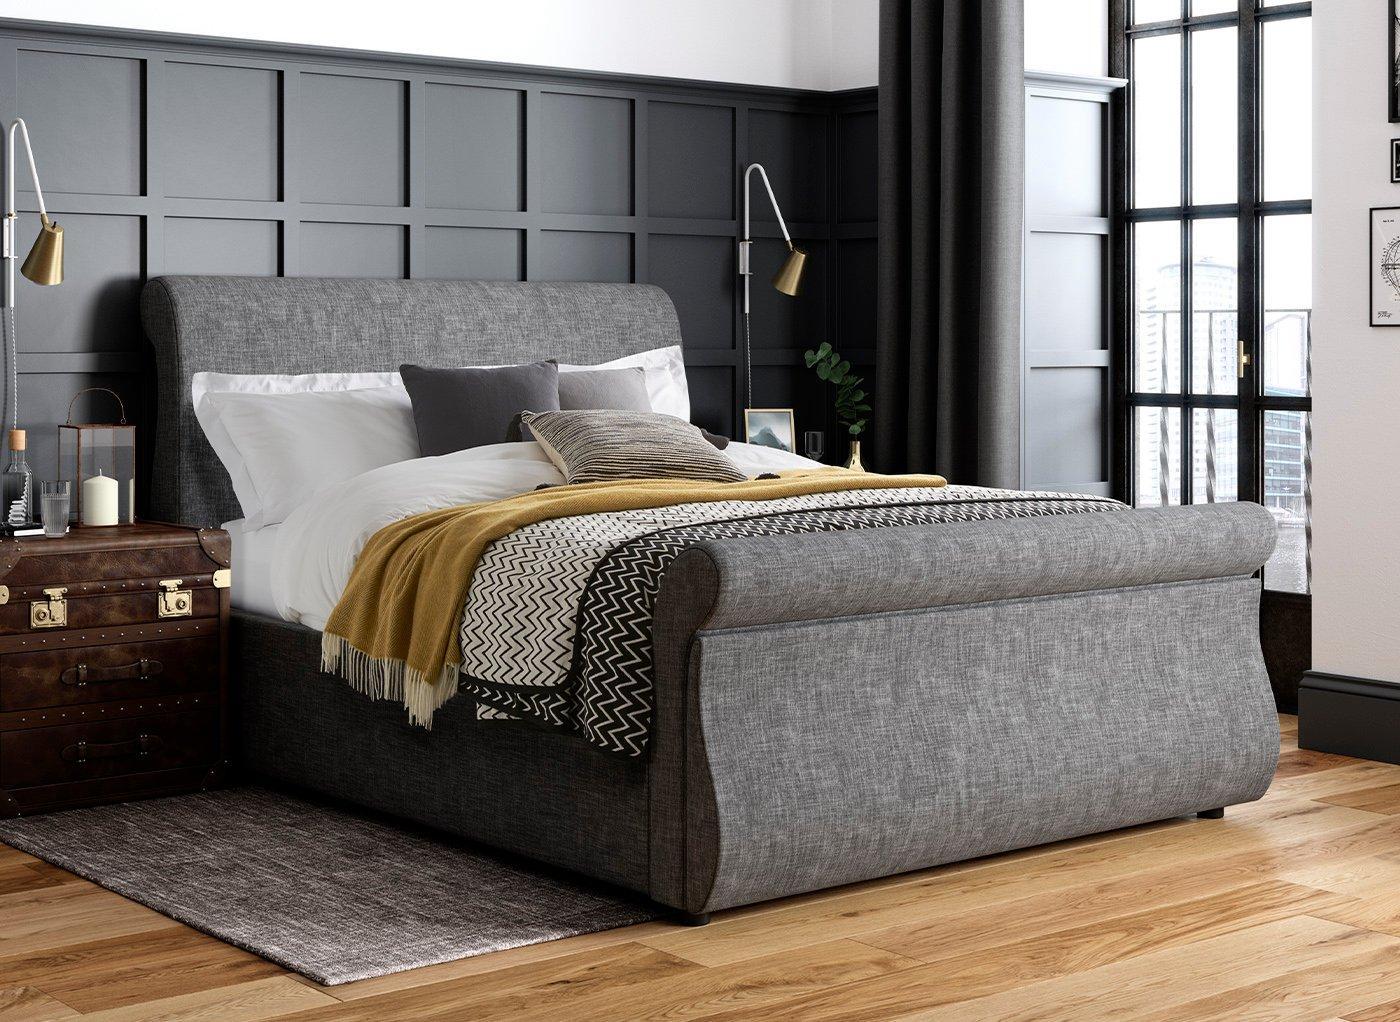 Detroit K Grey Fabric Drawer Bed (Solid Slats) 5'0 King